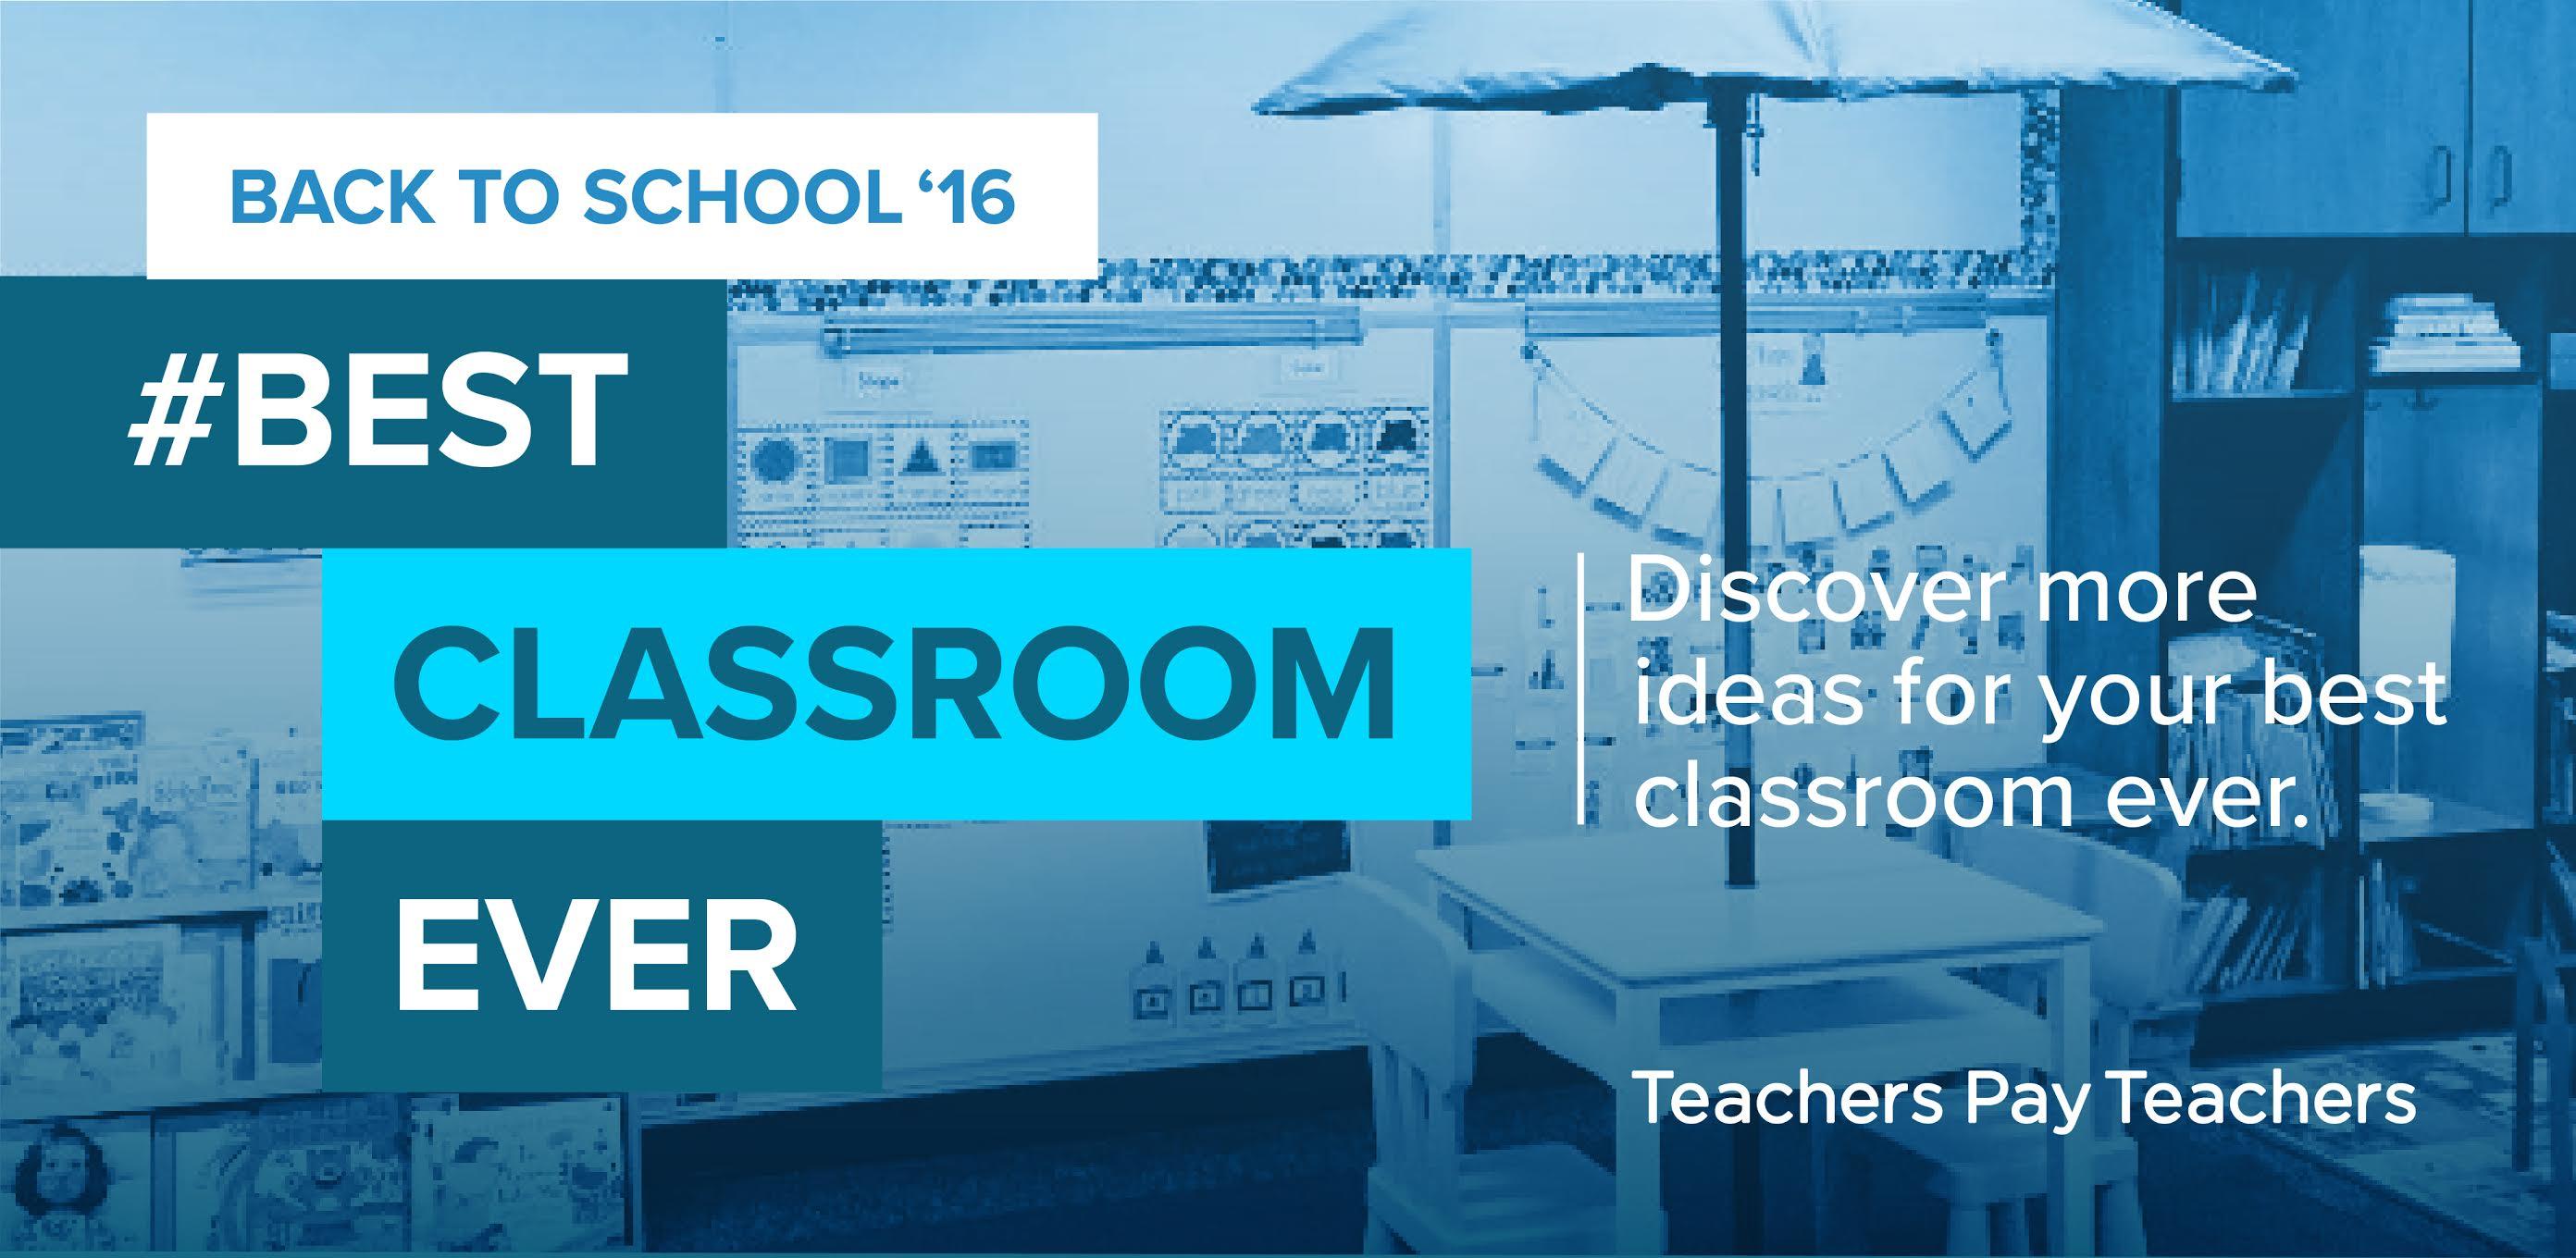 #BestClassroomEver